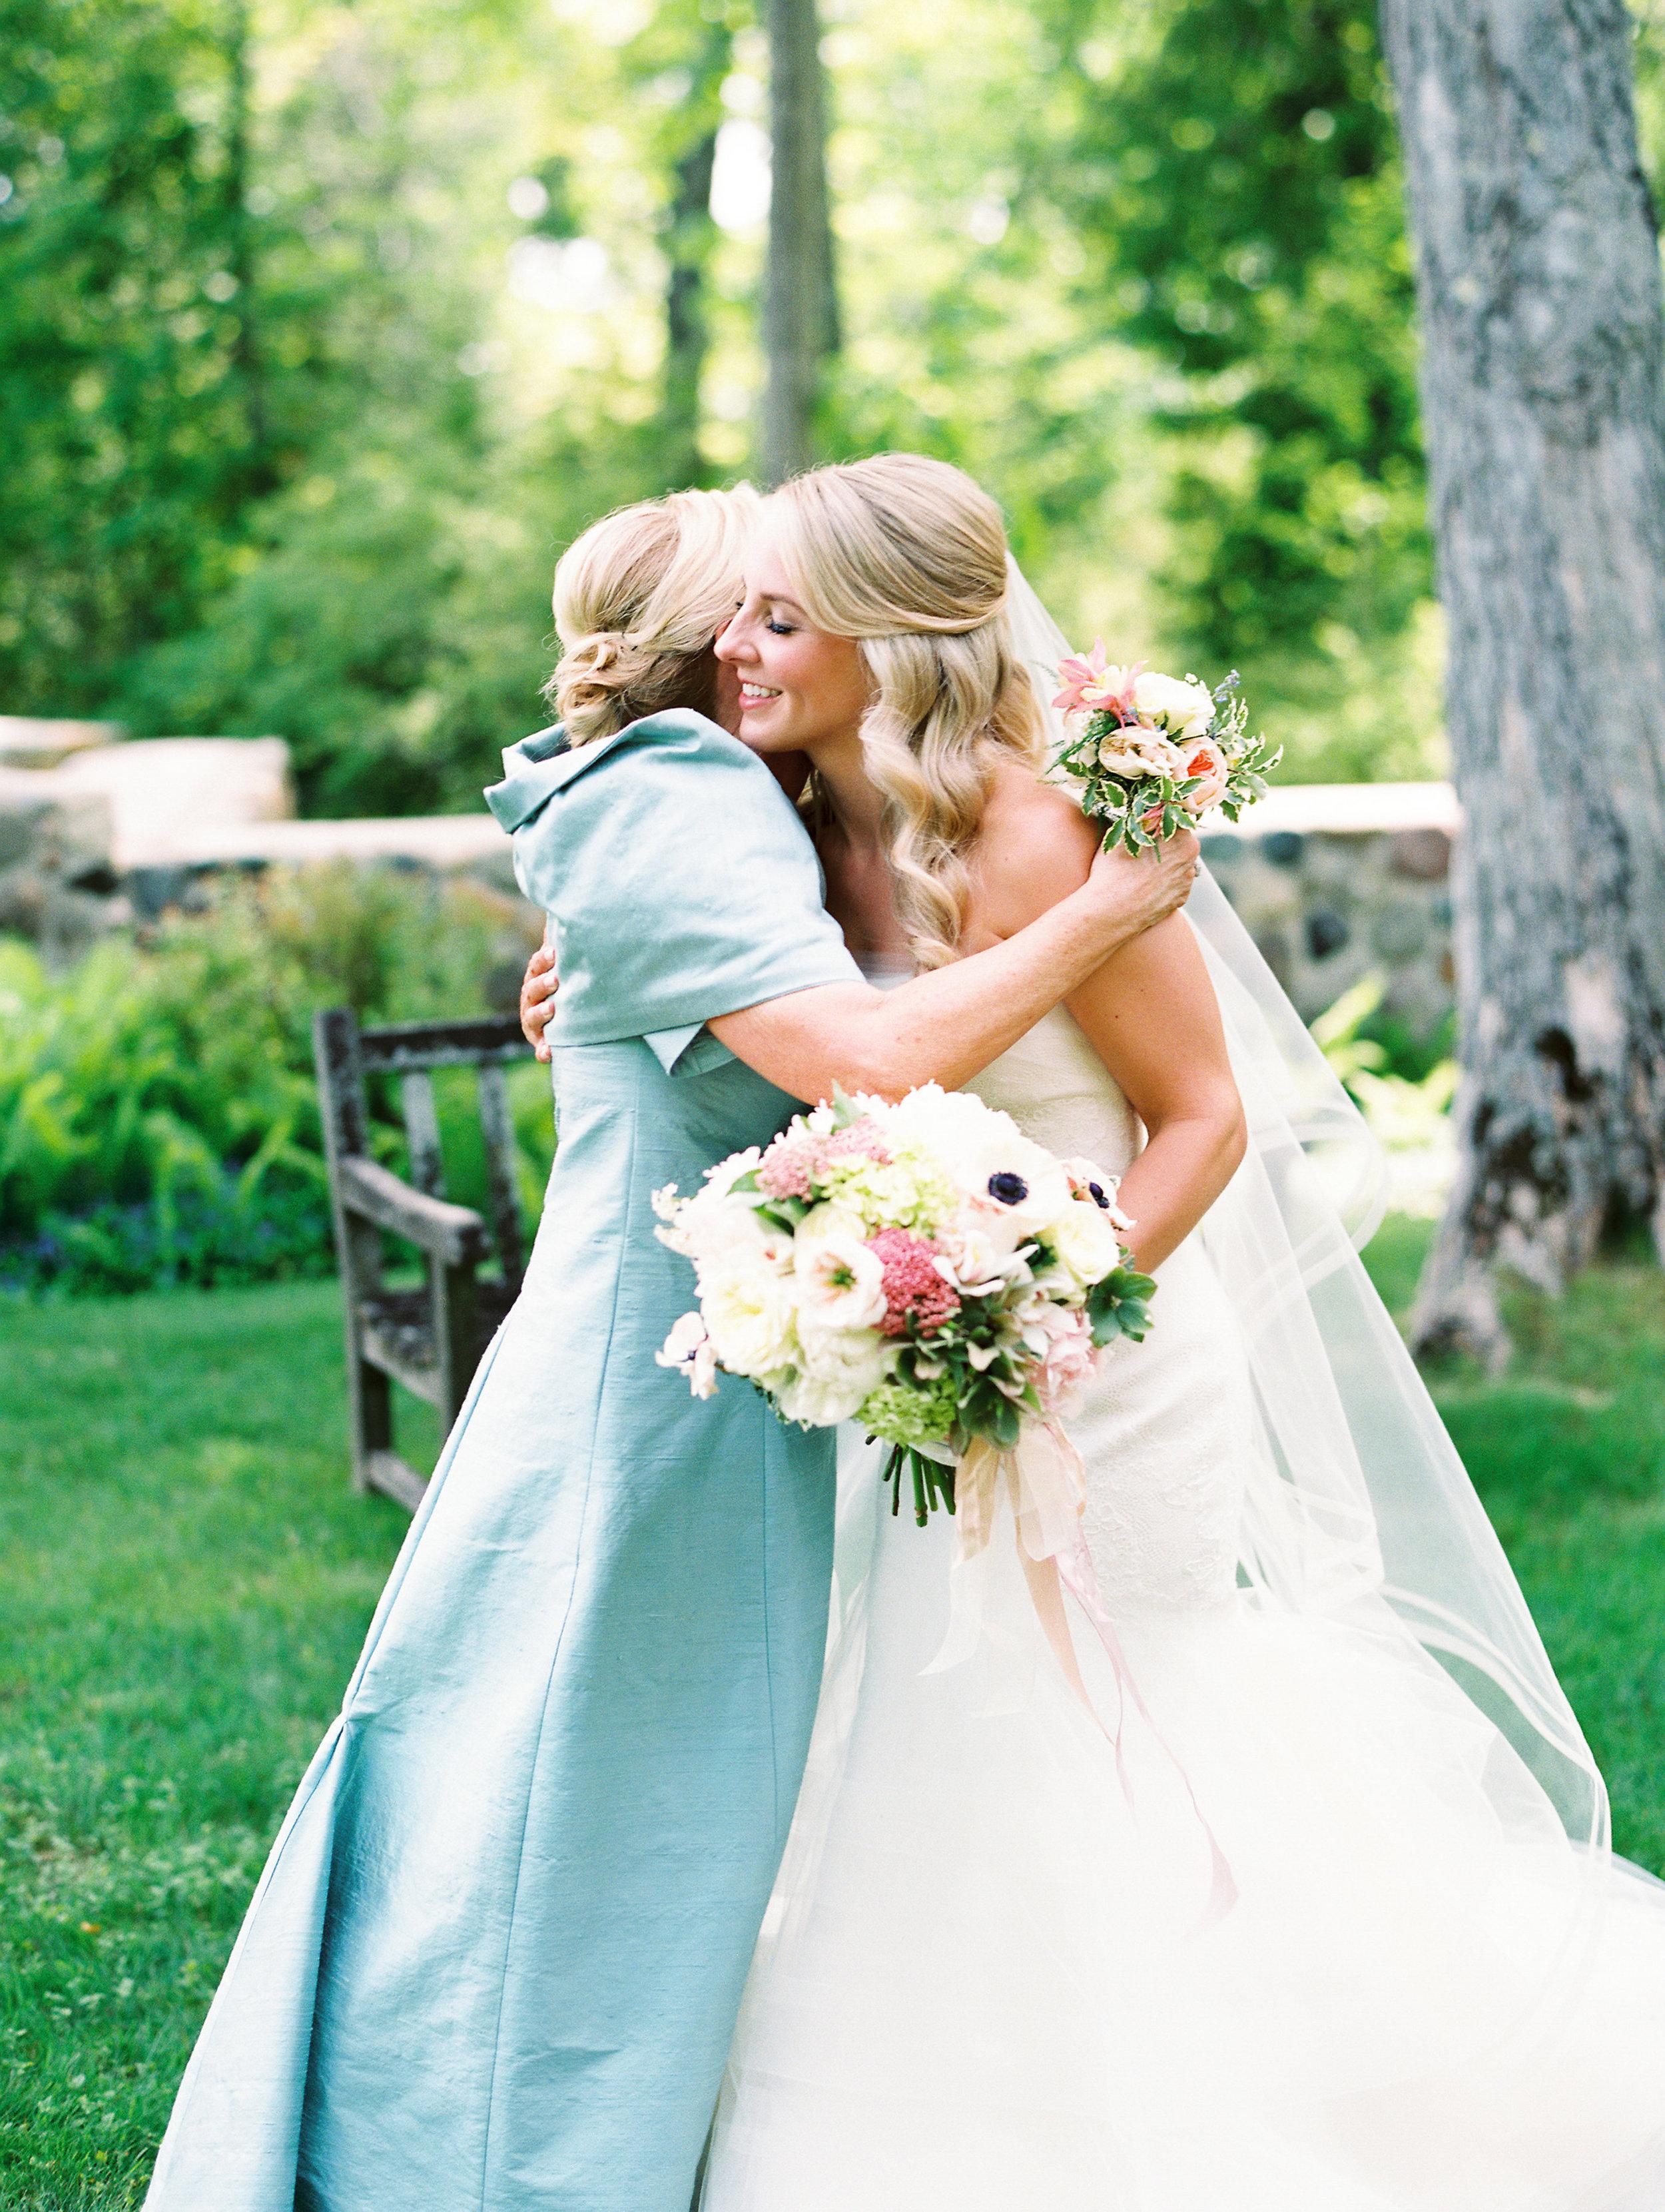 Coffman+Wedding+Familya-45.jpg